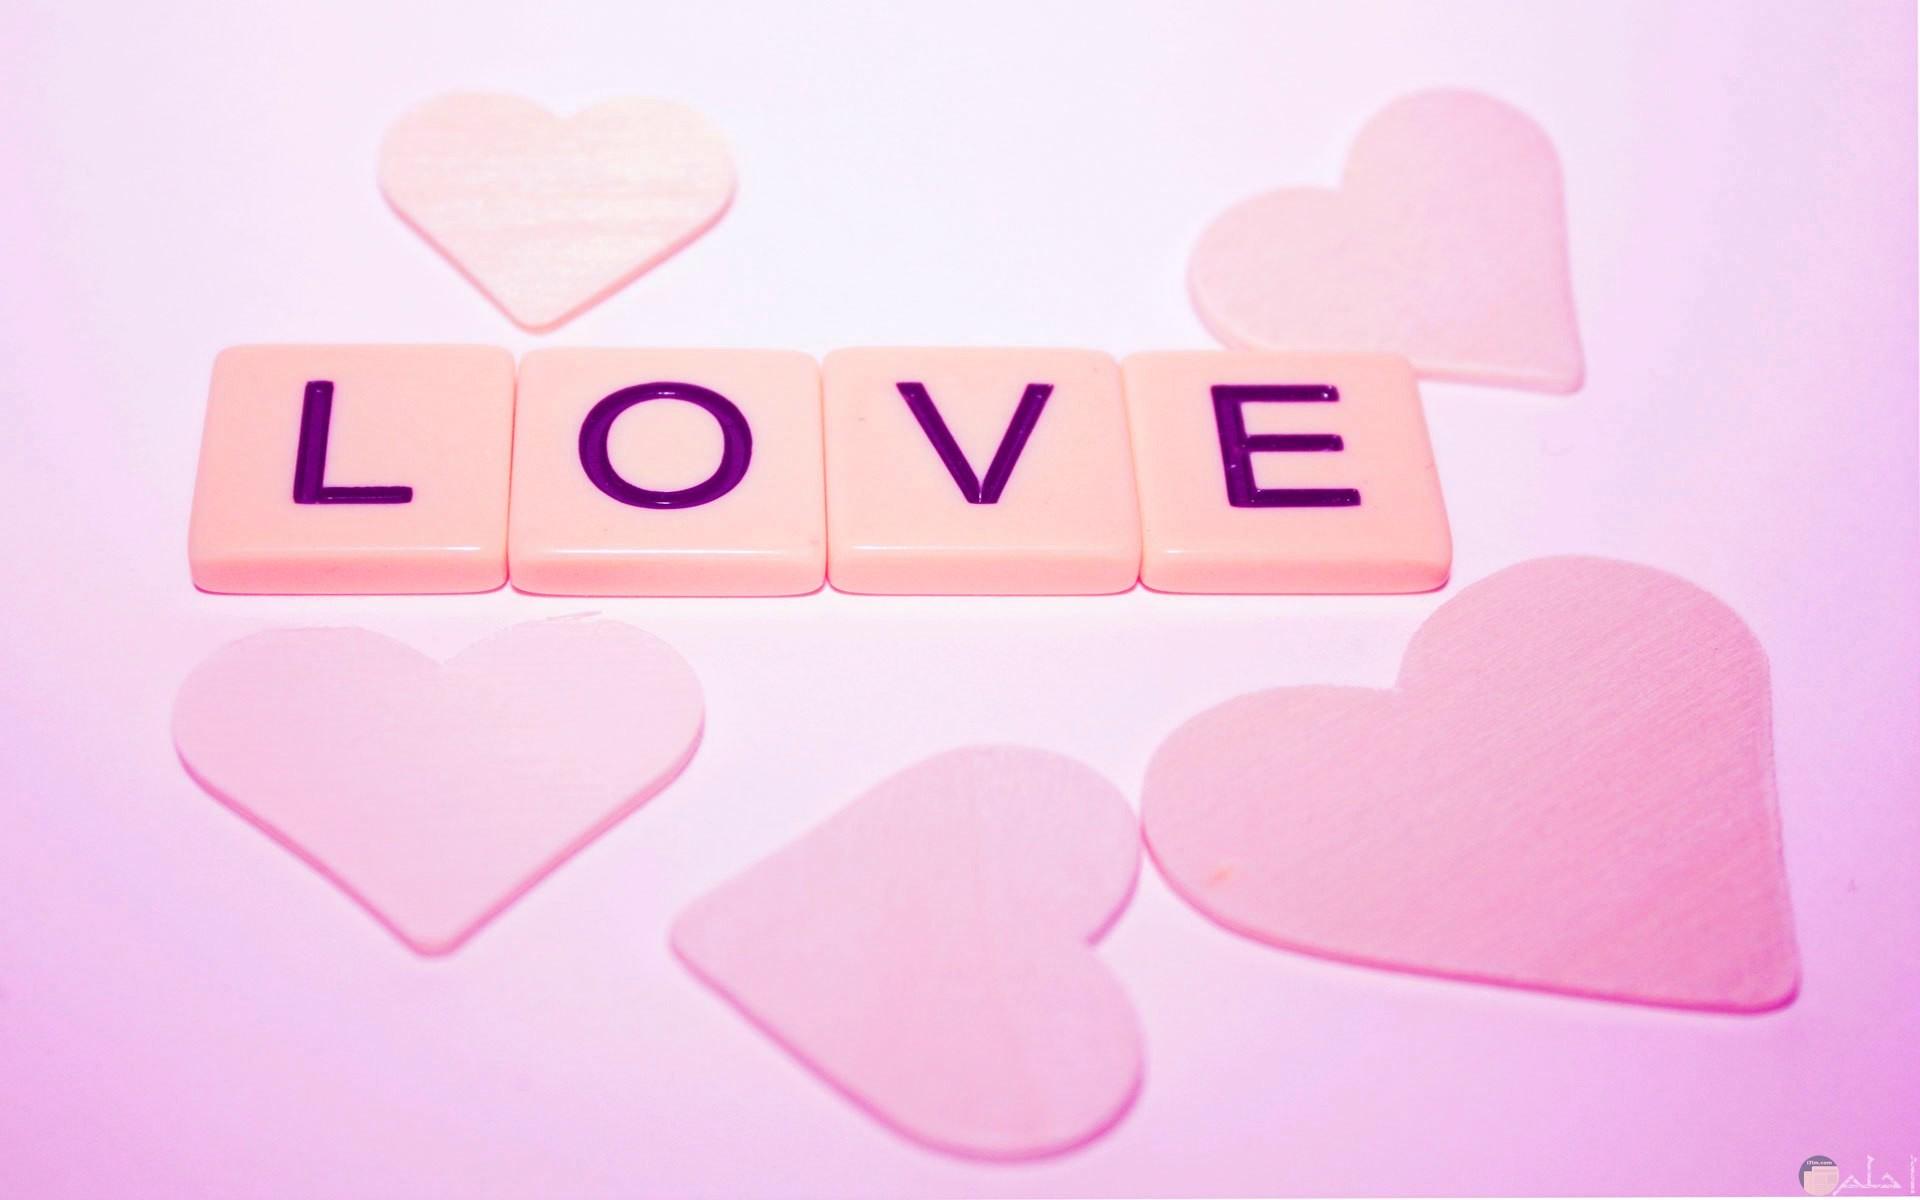 Love باللون الوردي الرقيق.